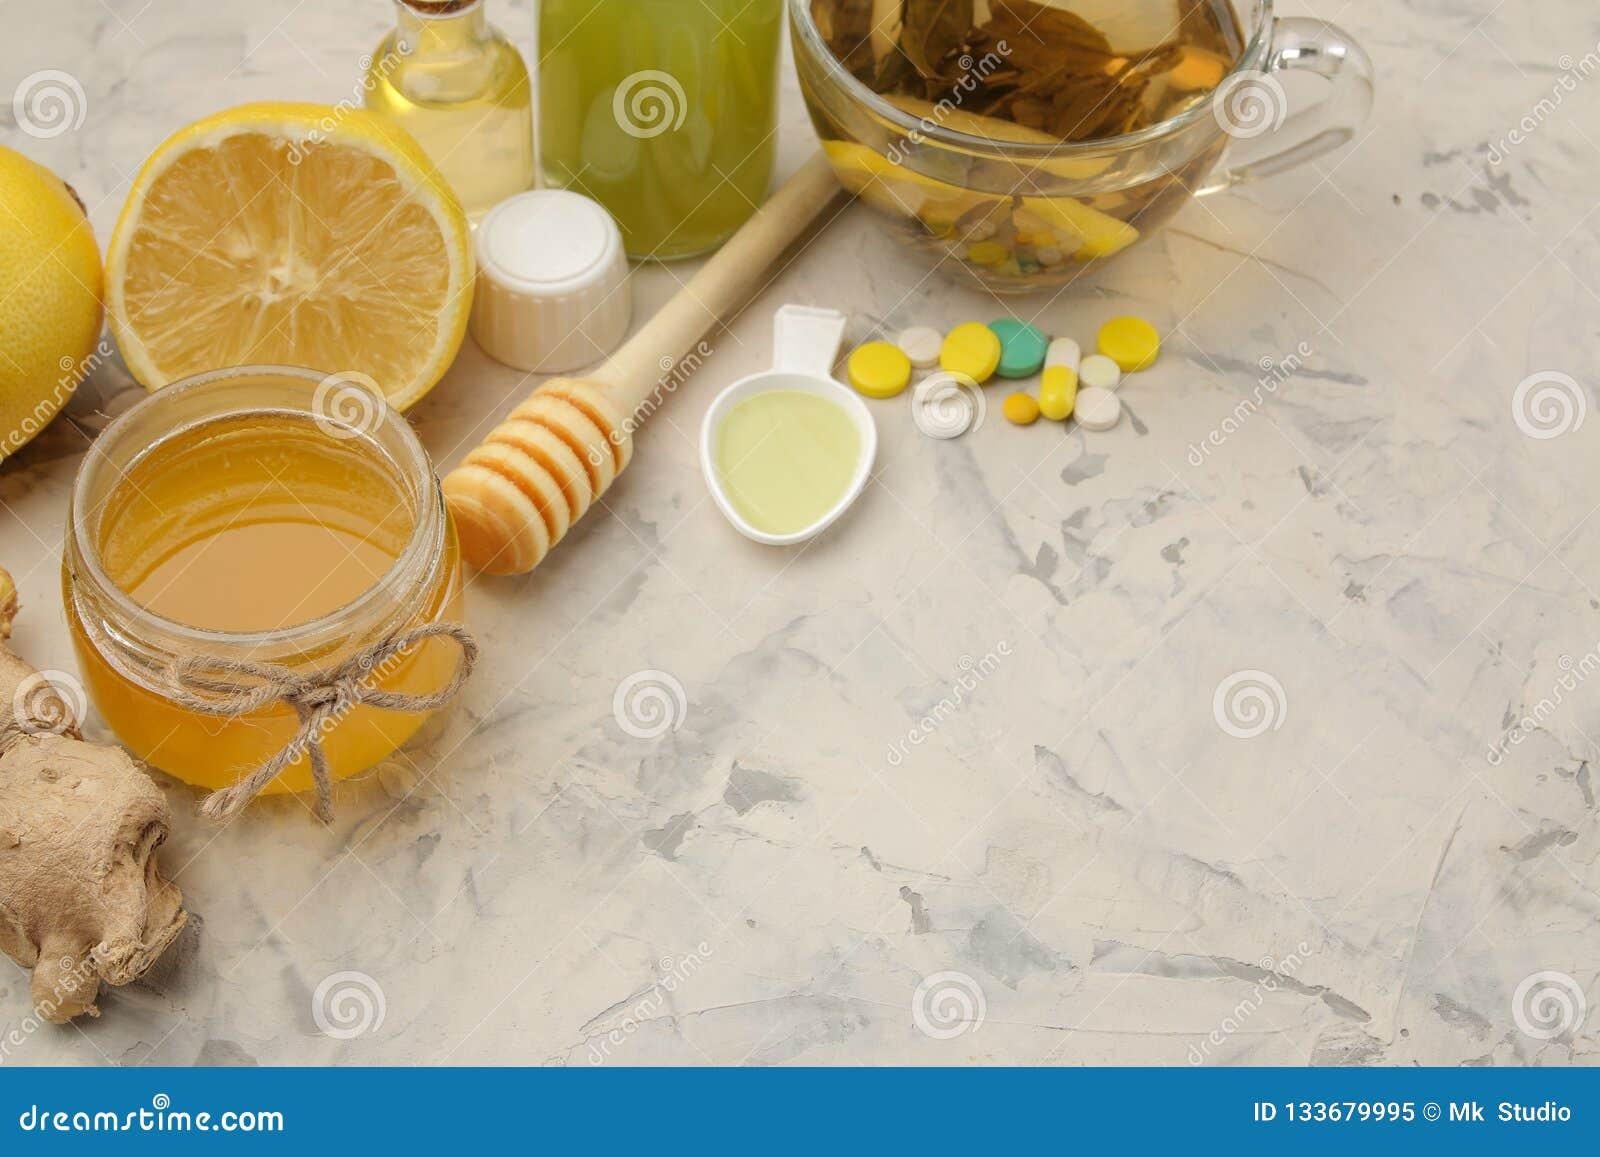 Varie medicine per influenza e rimedi freddi su una tavola di legno bianca freddo malattie freddo flu